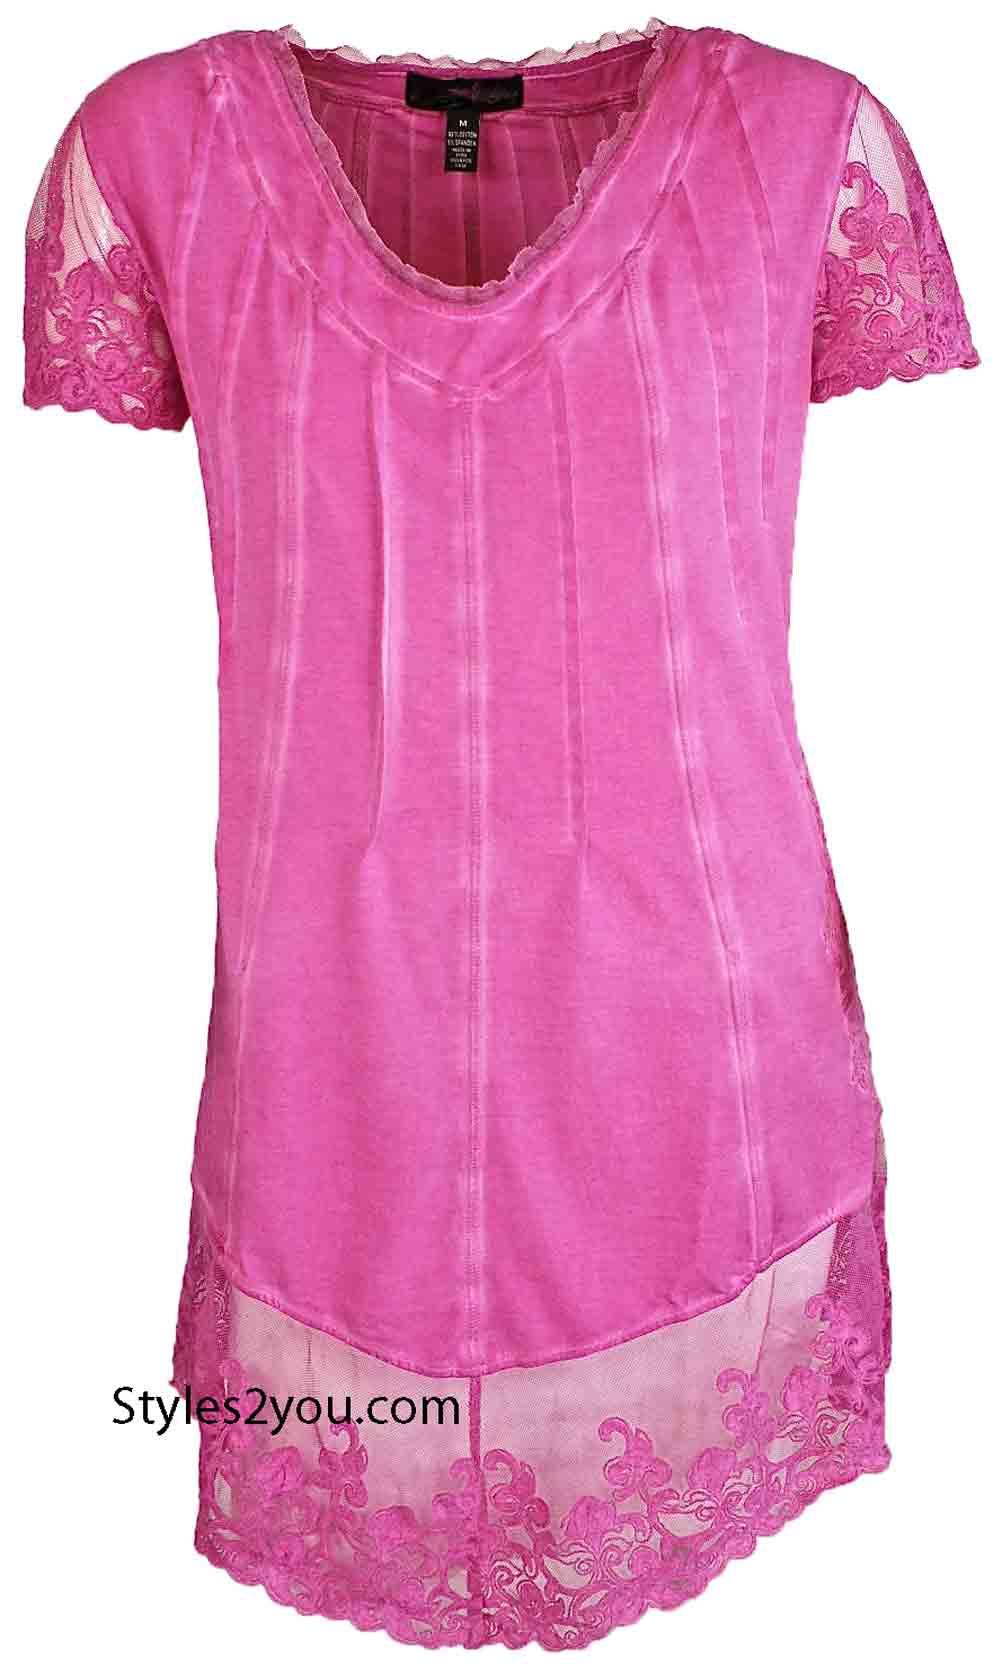 Luella Plus Size Vintage Lace Top In Raspberry Gretty